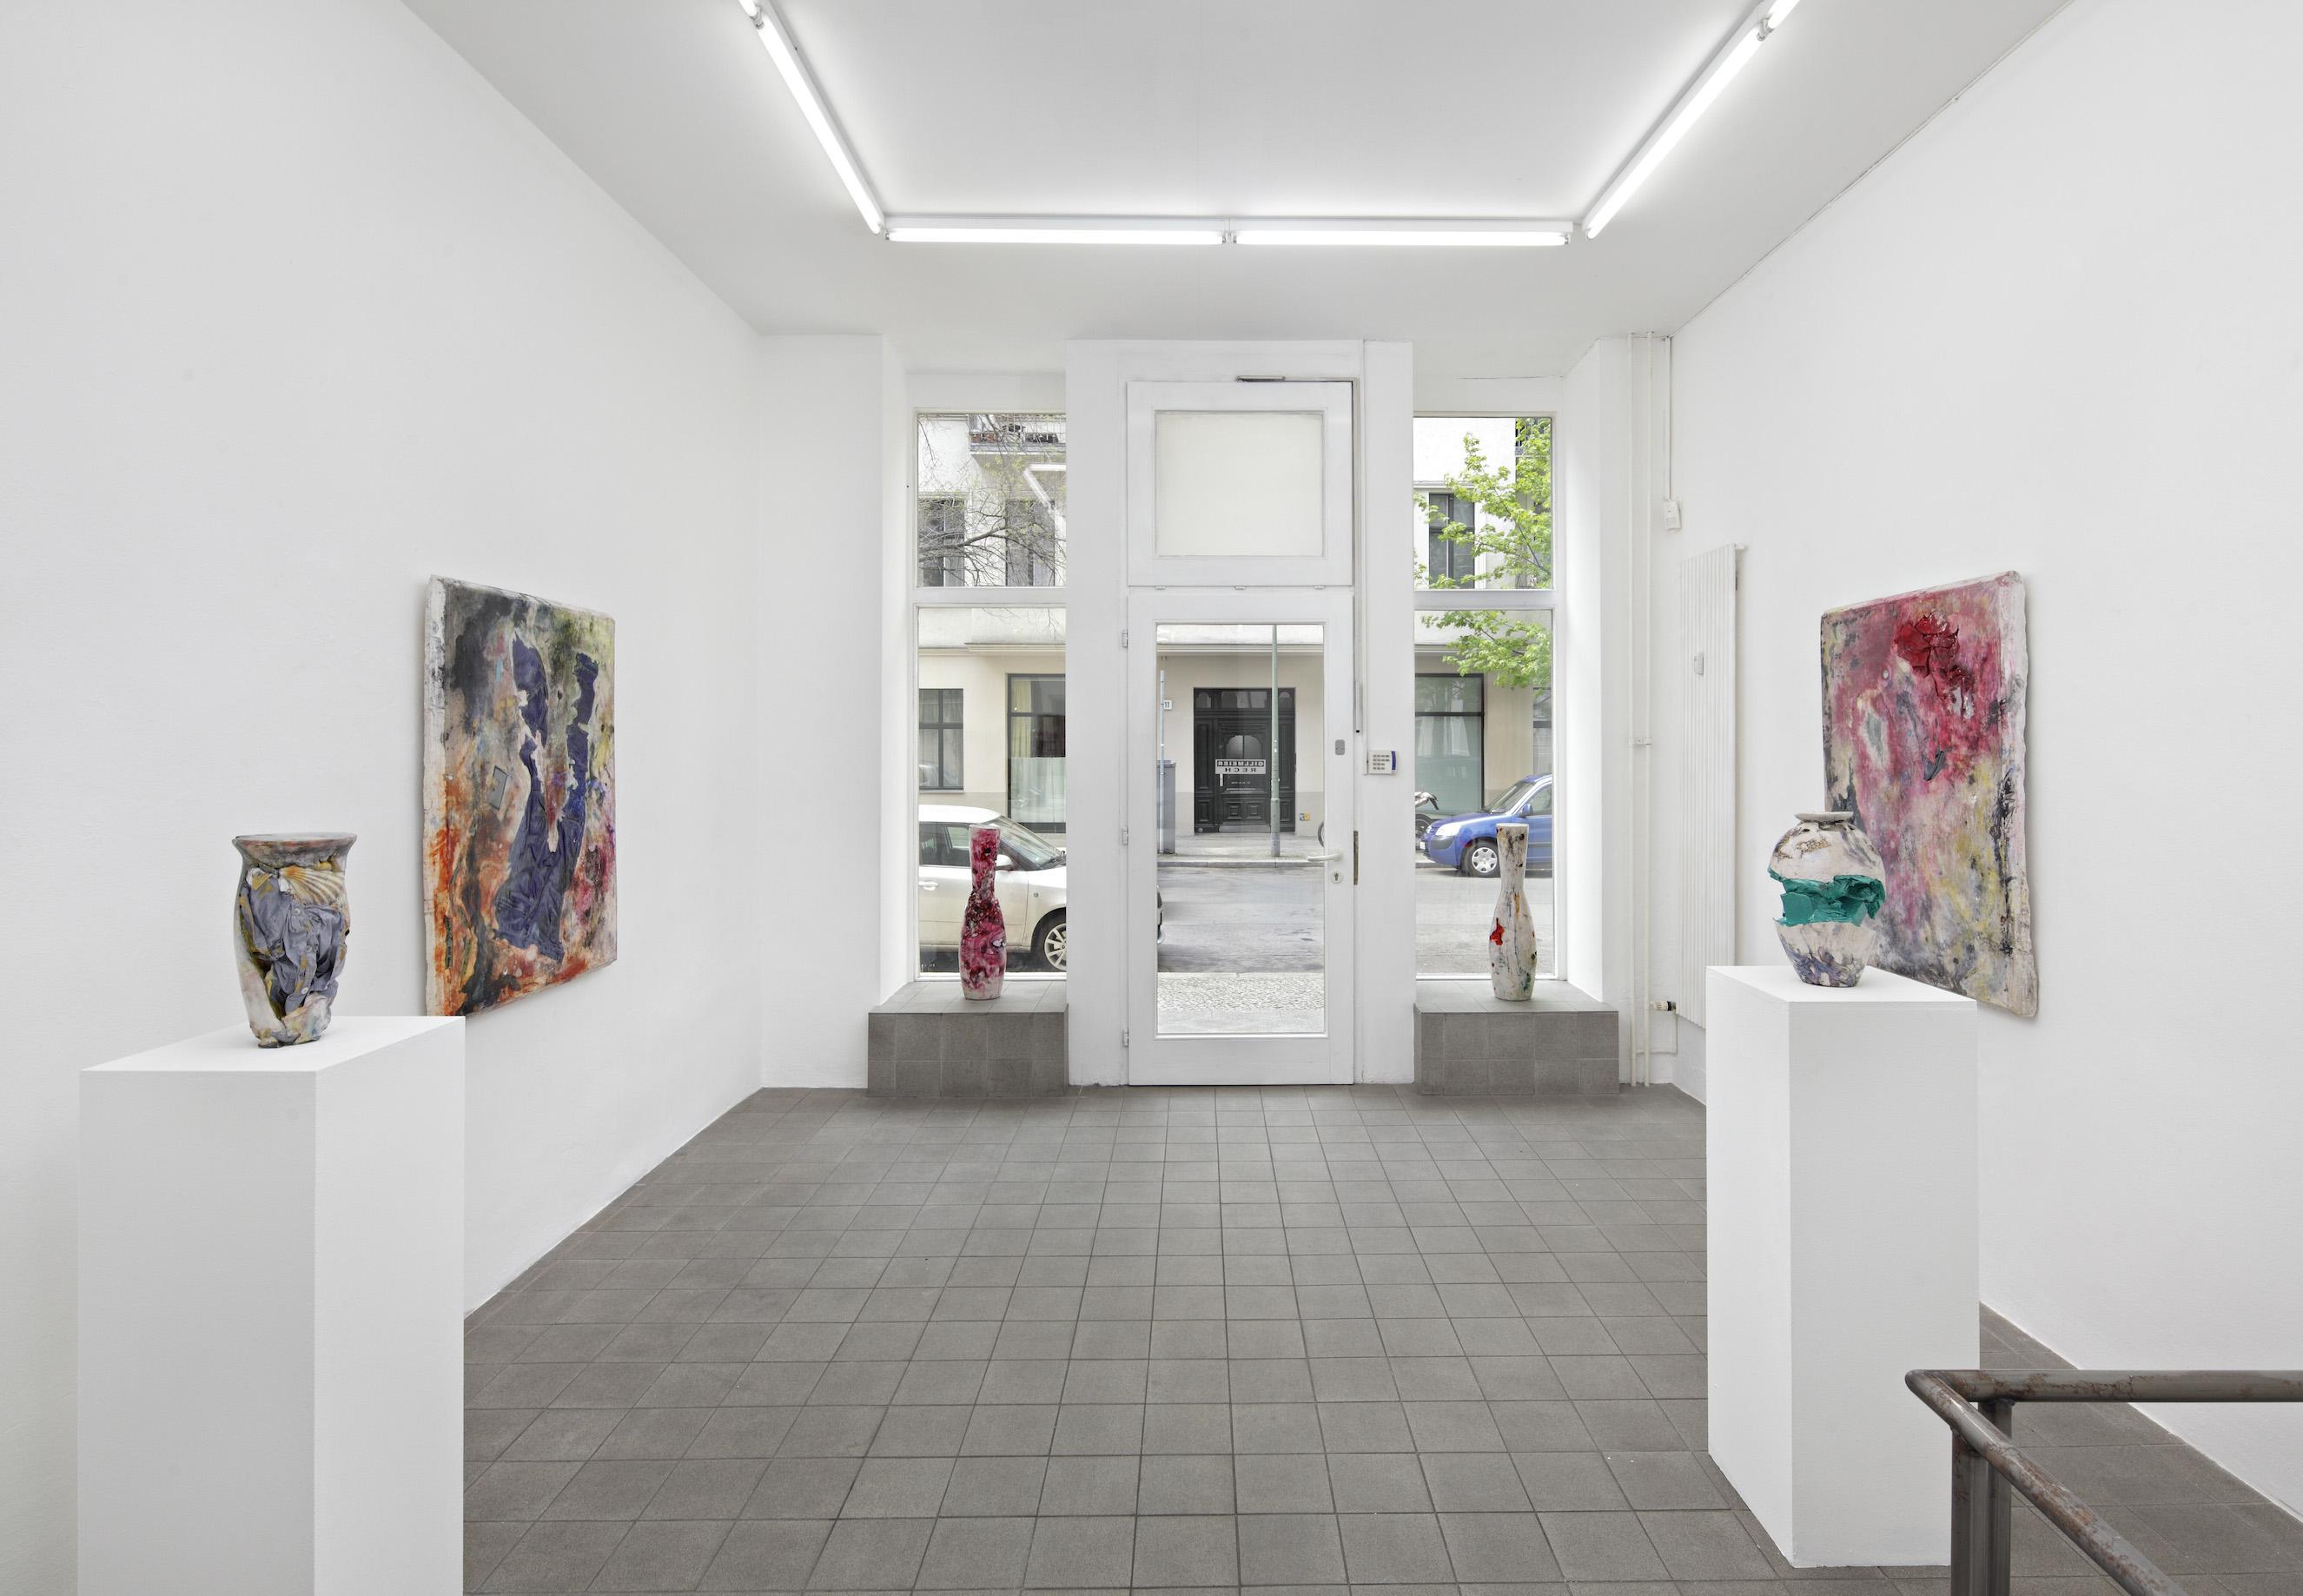 Exhibition view. Gillmeier Rech, Berlin, 2015 / photo © Hans-Georg Gaul